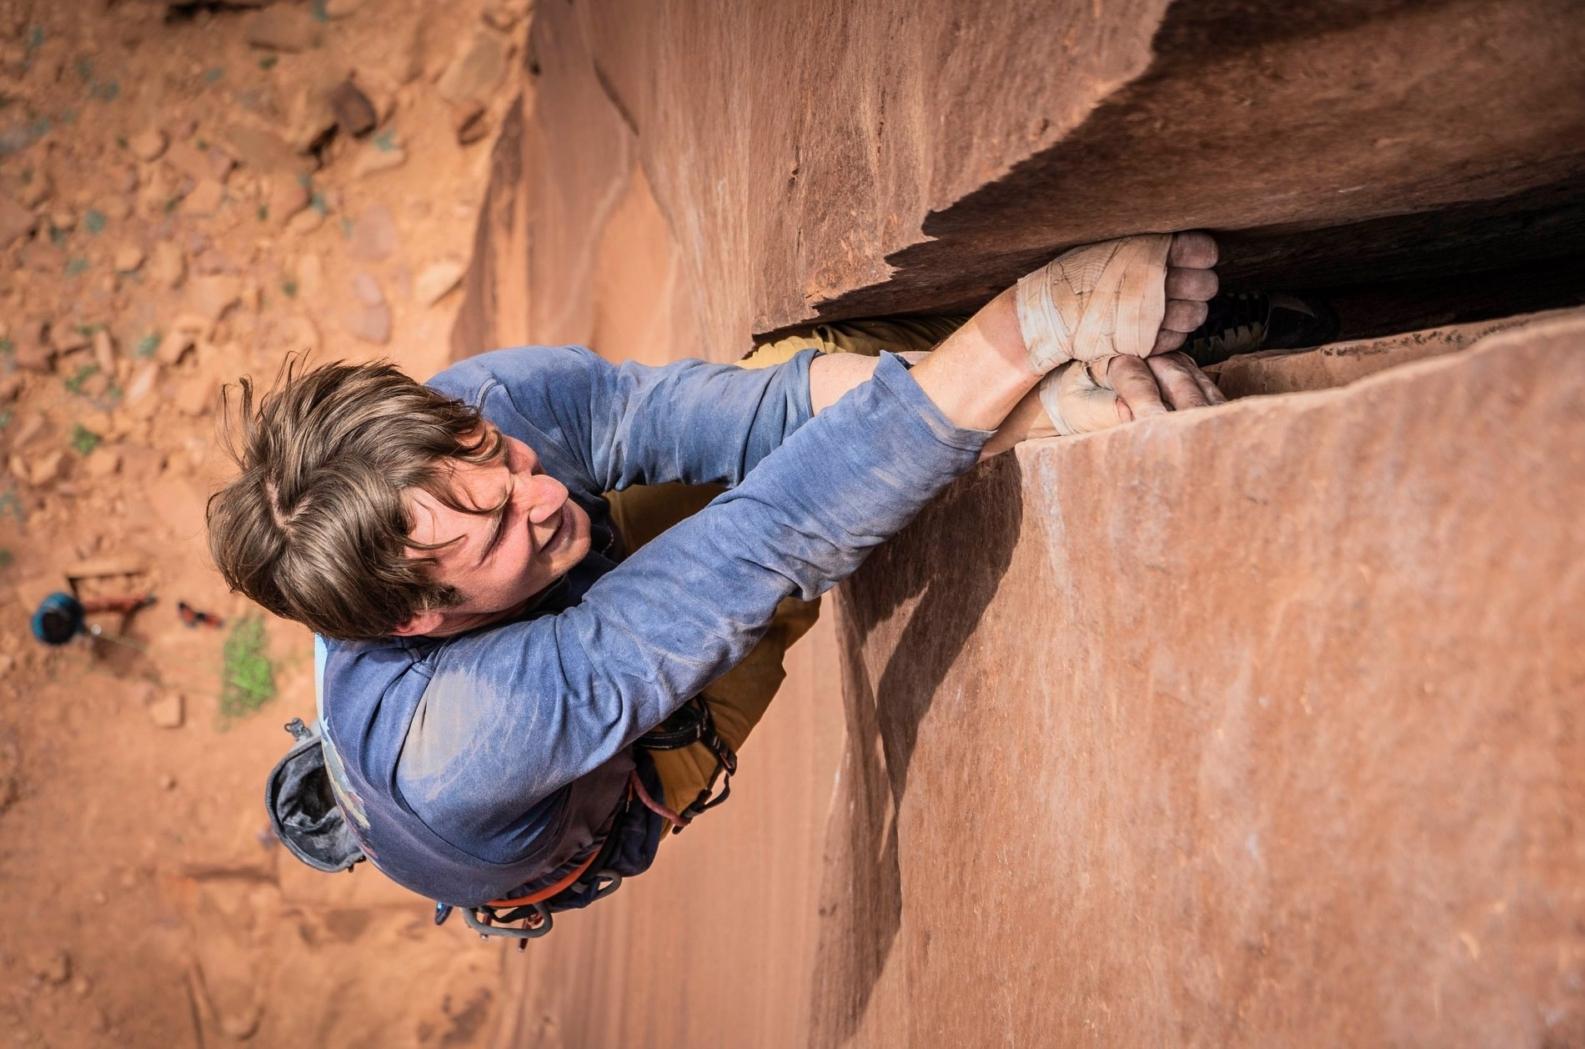 Climber P Whittaker